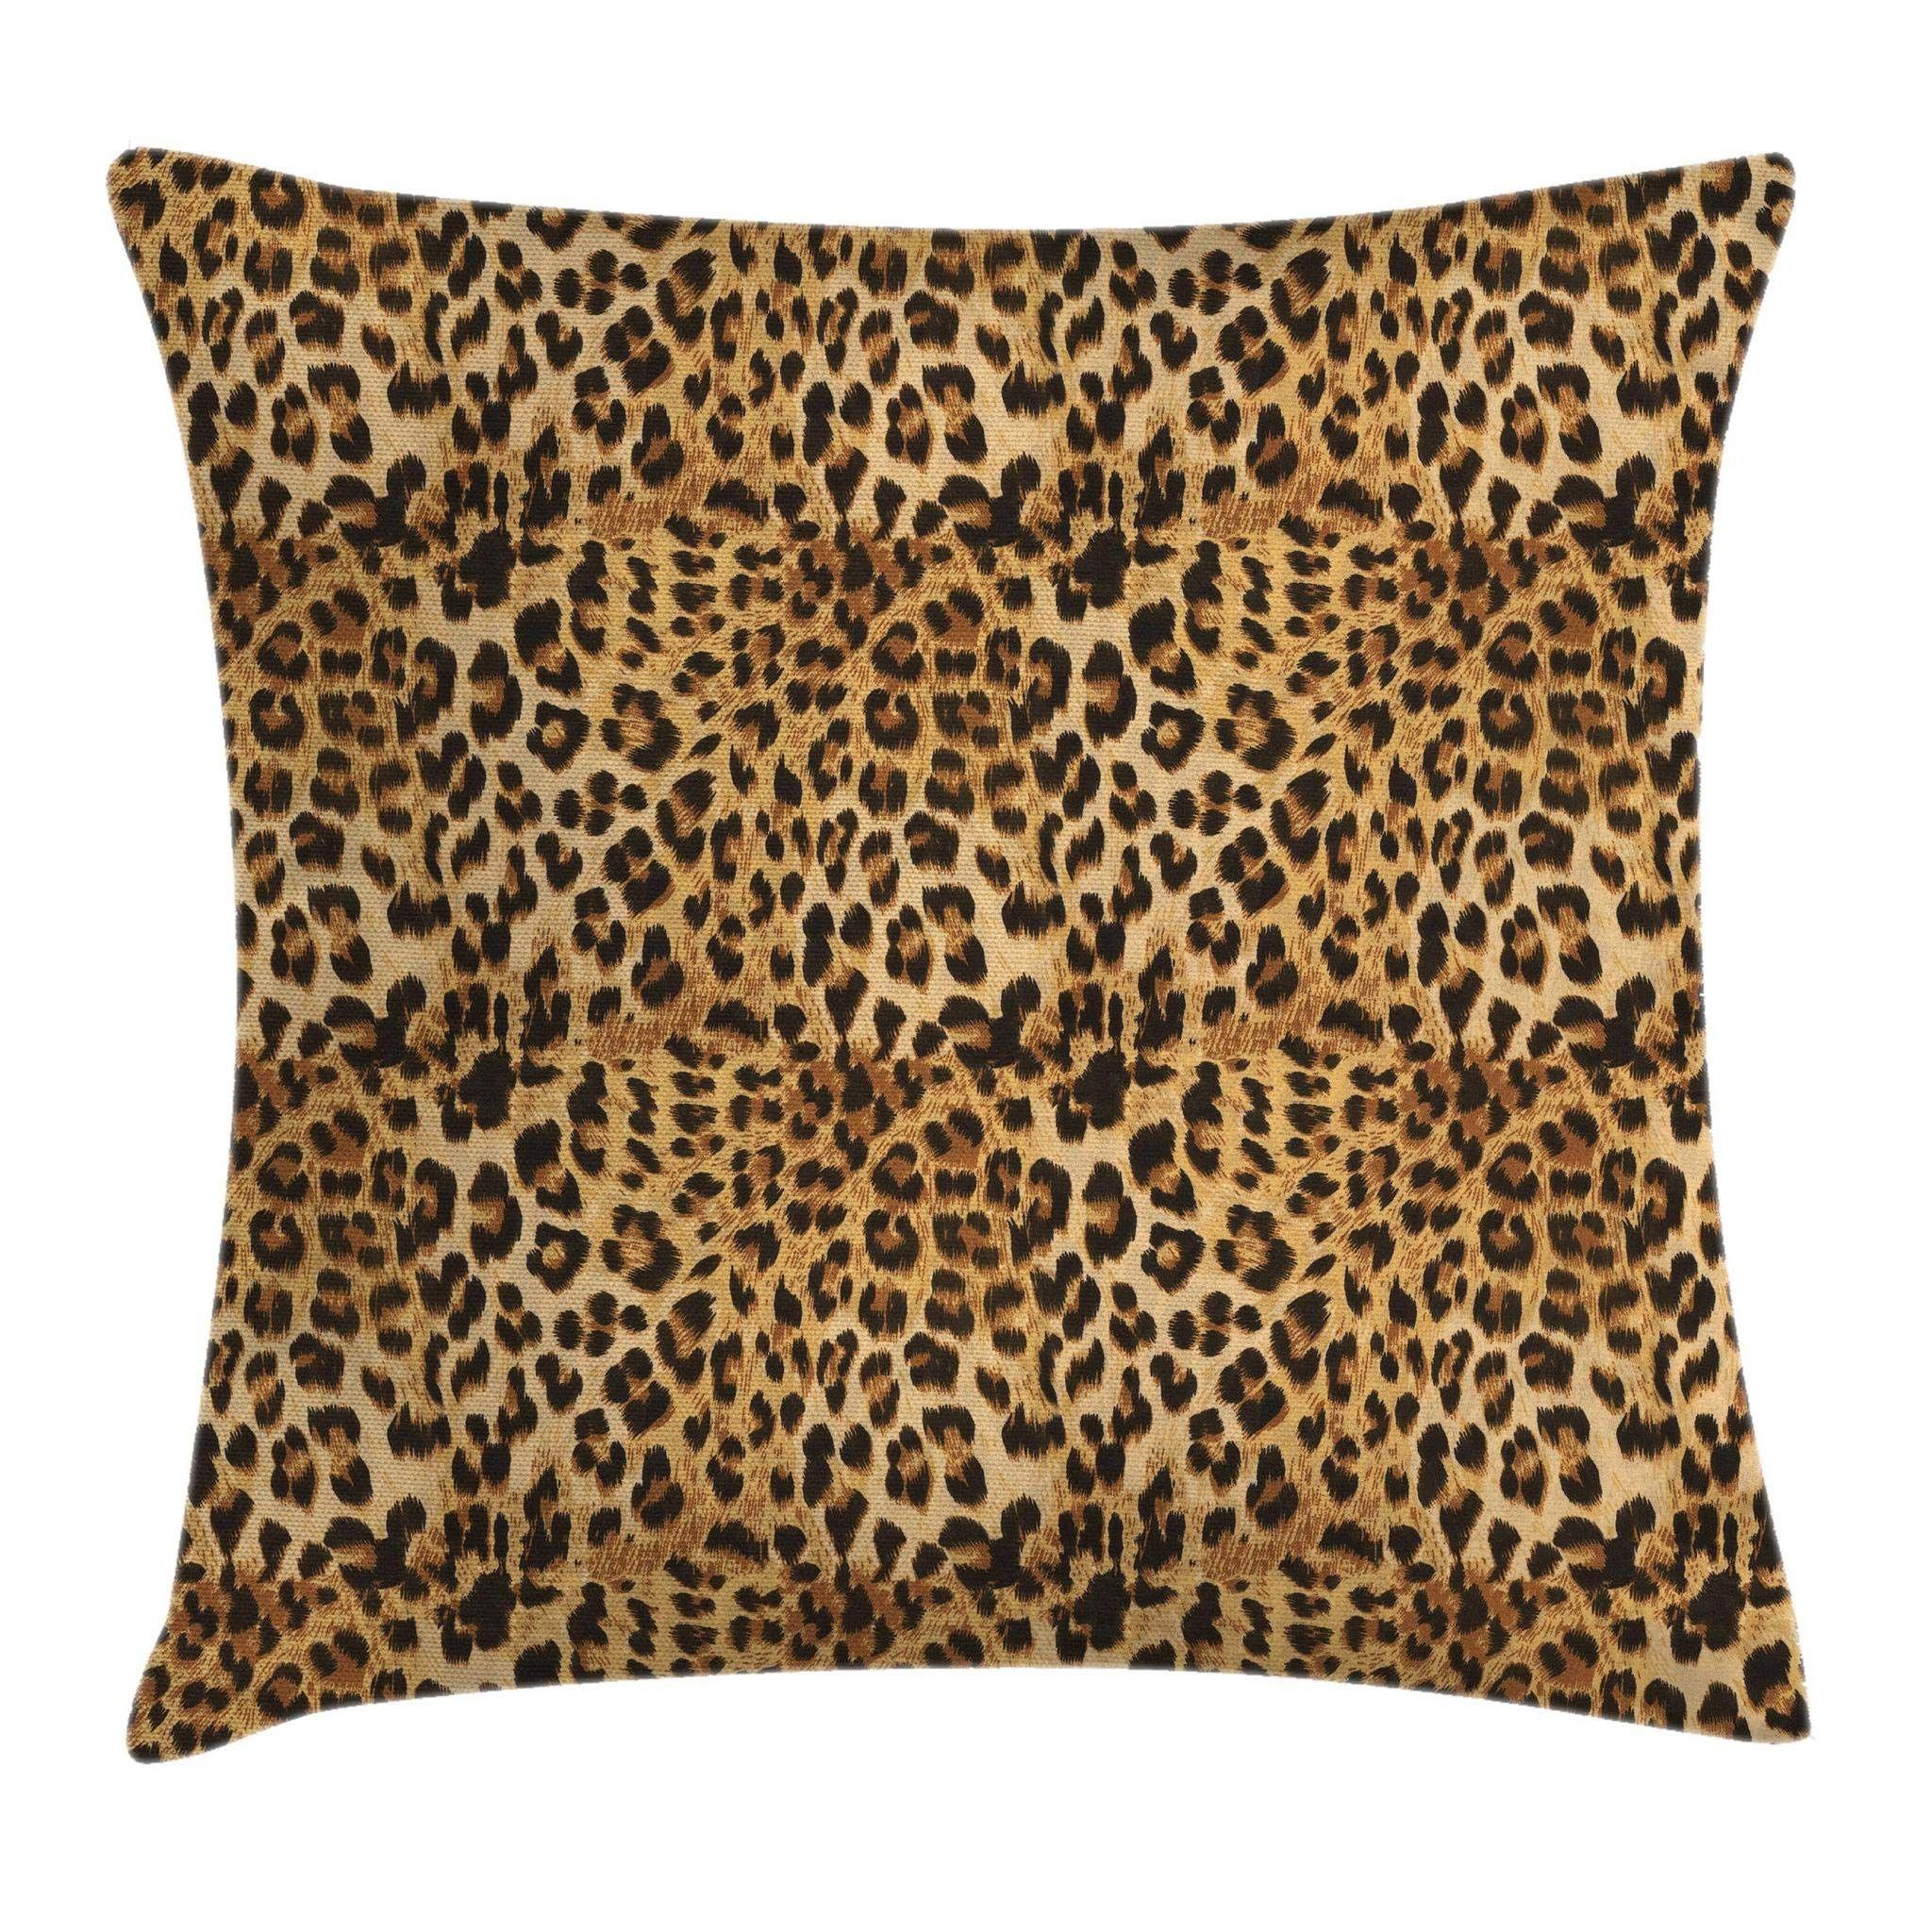 Ambesonne Brown Throw Pillow Cushion Cover Leopard Print Animal Skin Digital Pr Ambesonn Brown Throw Pillows Leopard Print Pillows Cushion Pillow Covers